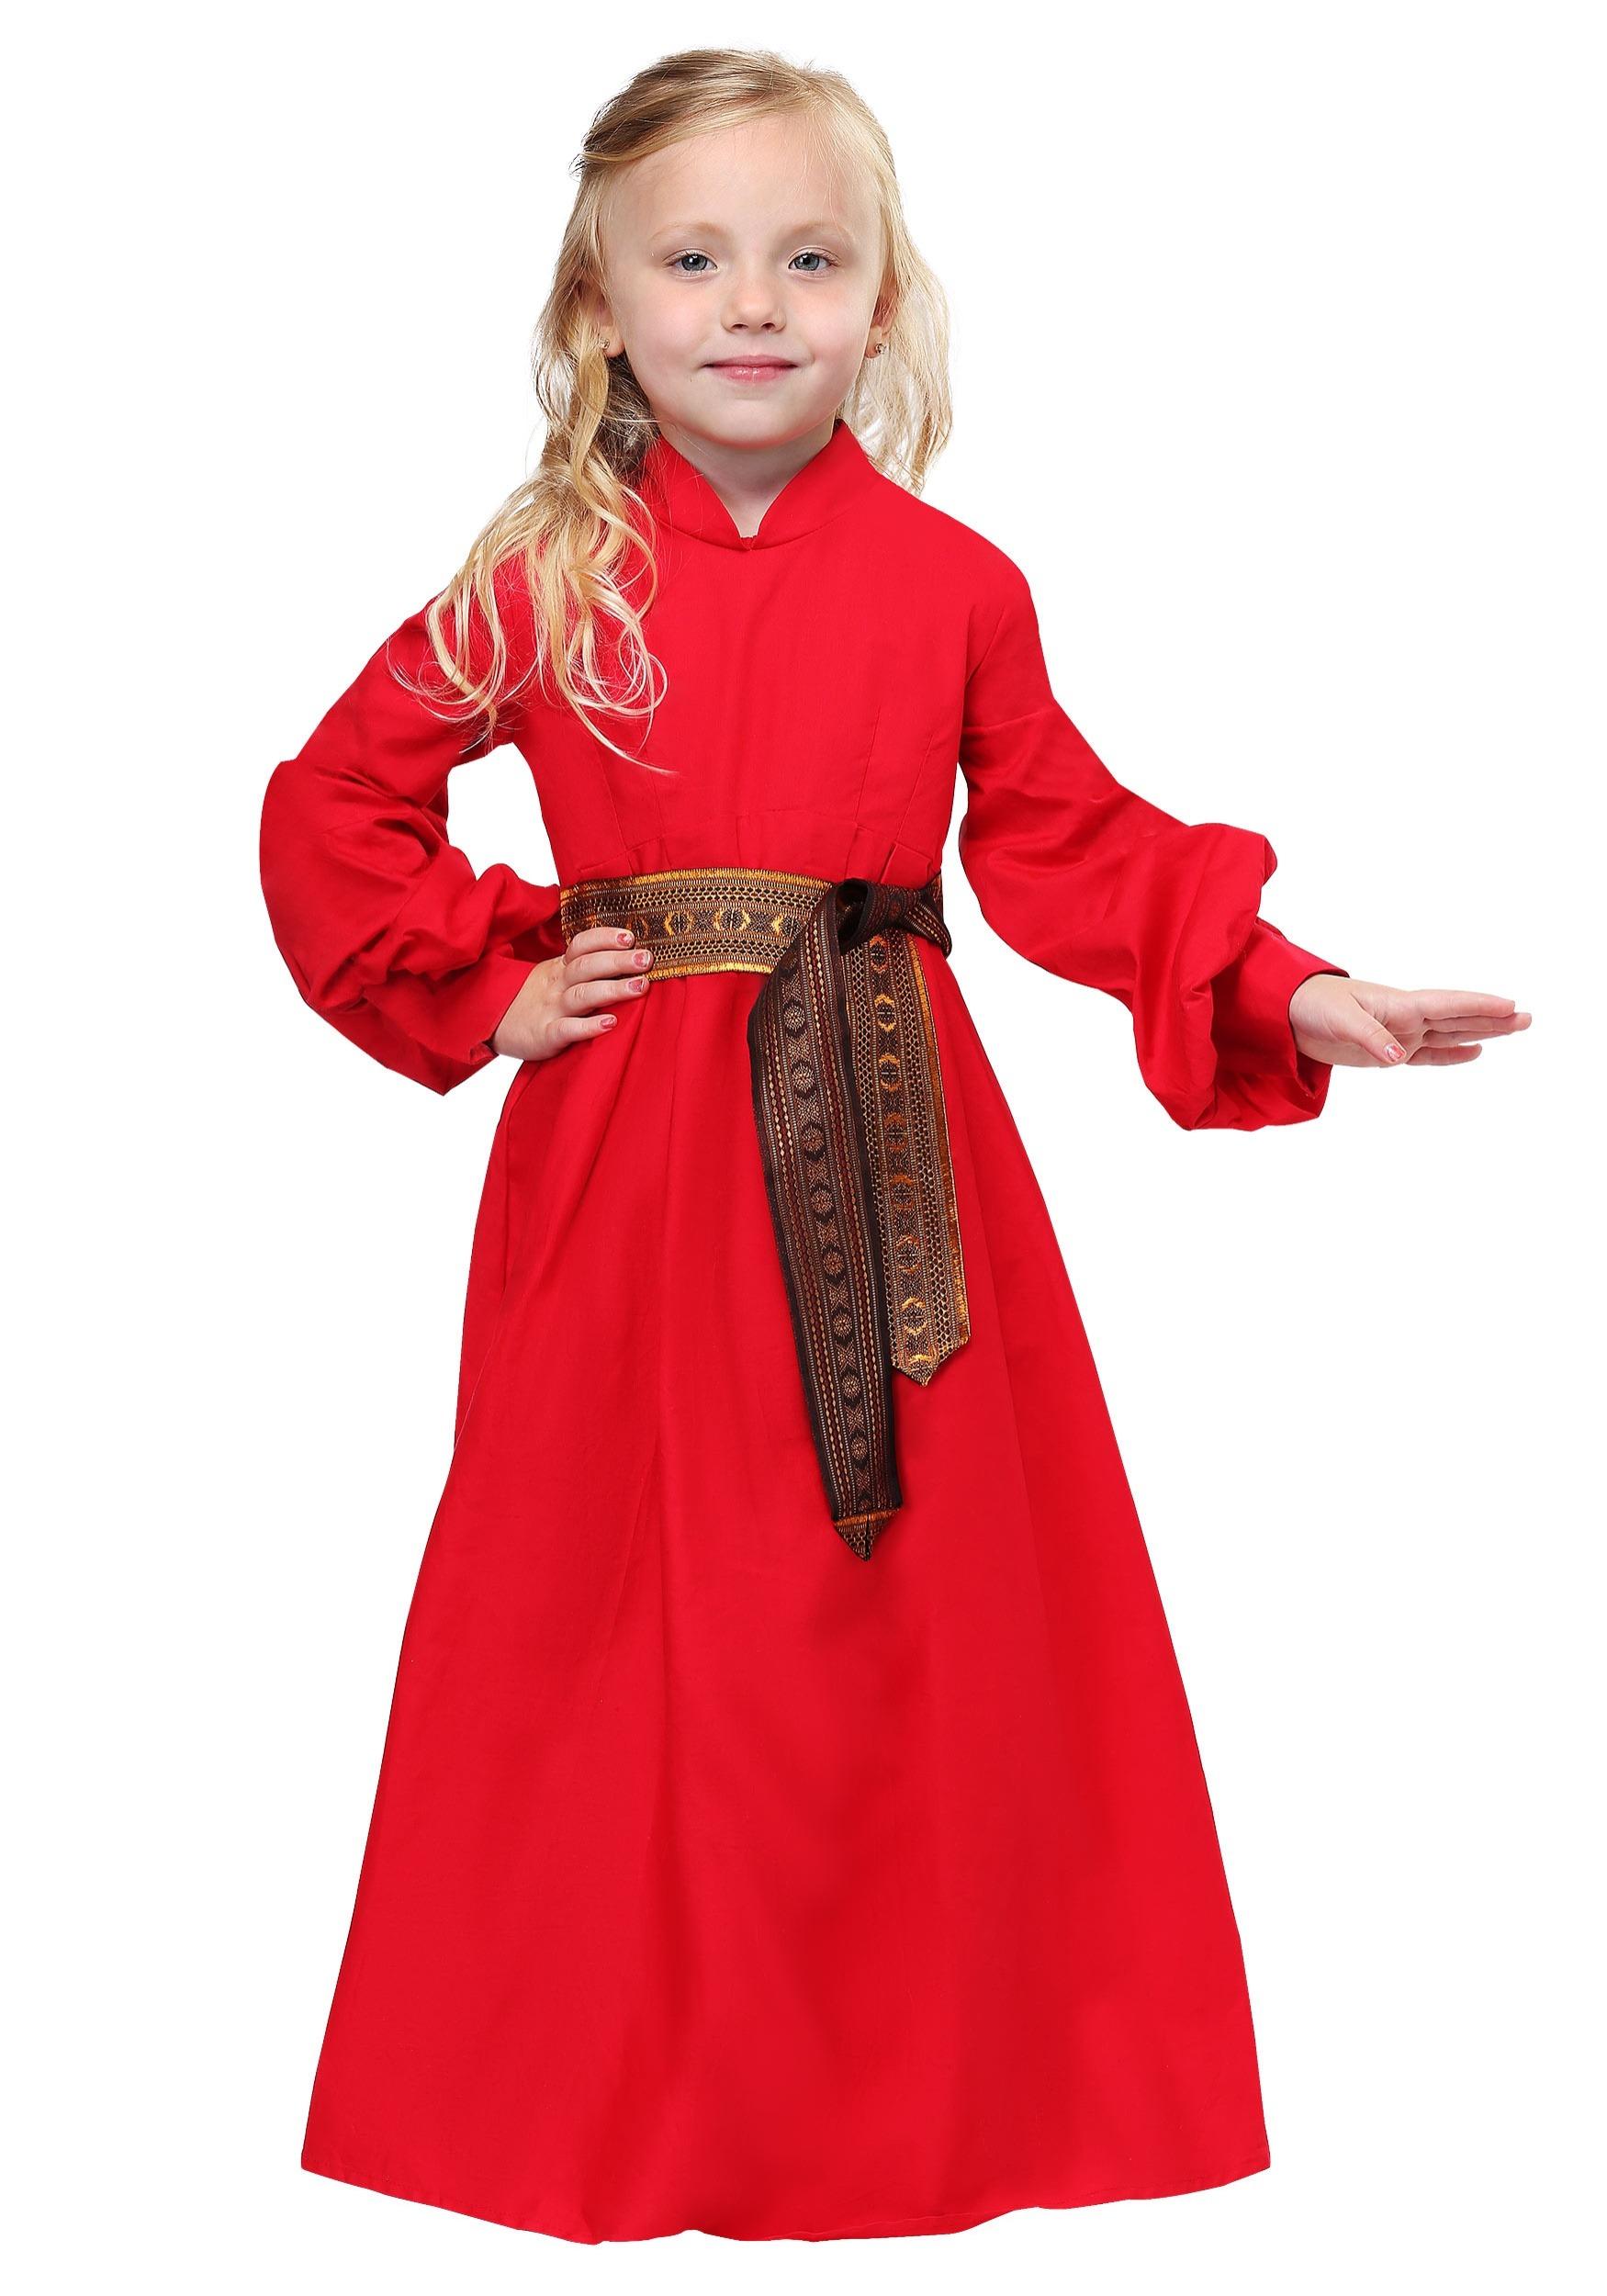 Girls Princess Bride Buttercup Peasant Dress